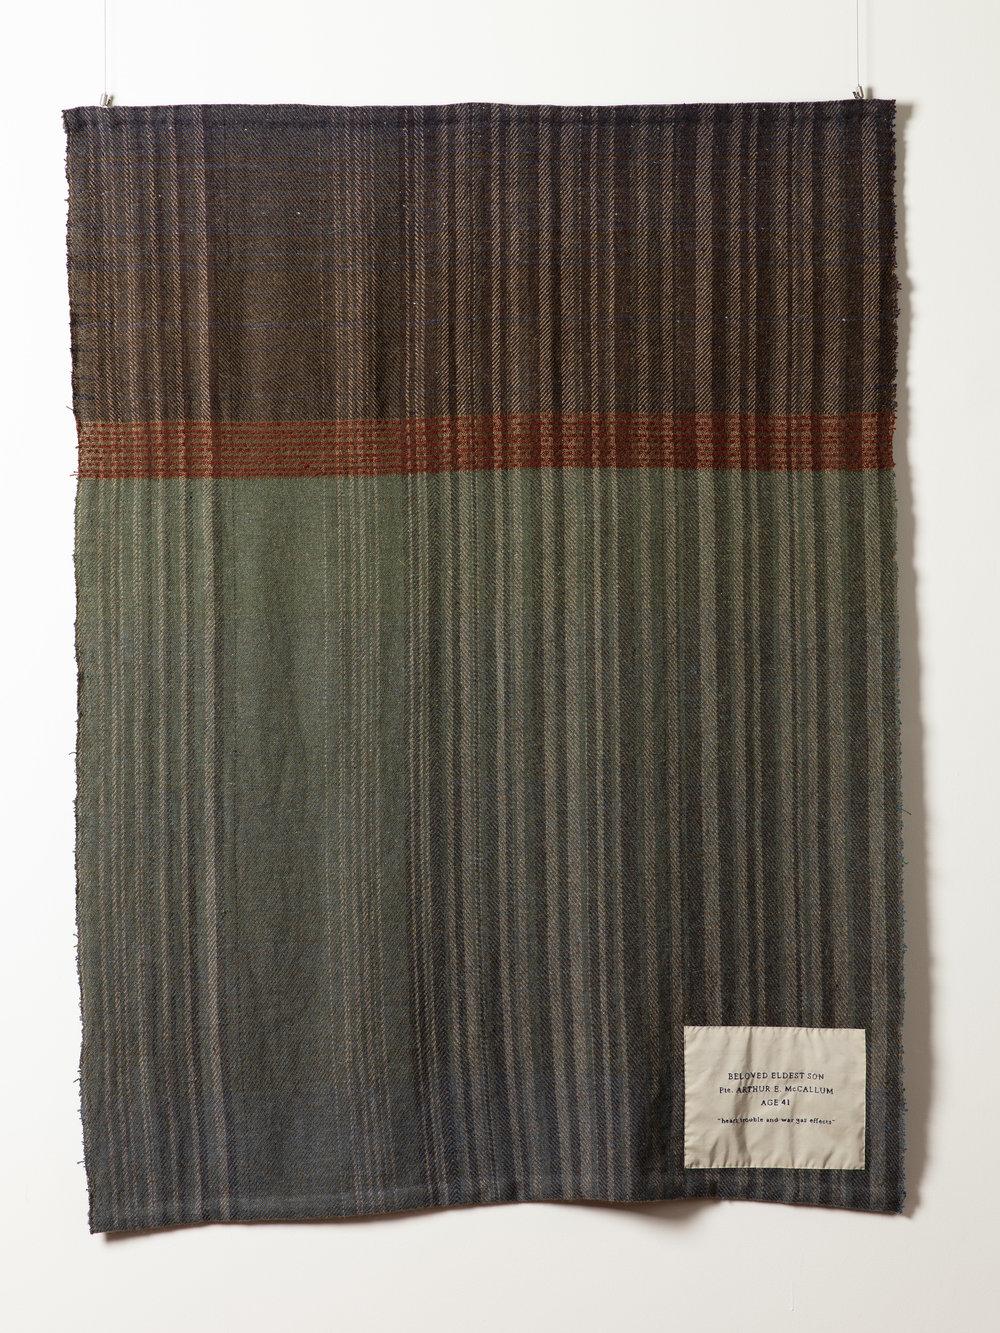 Blanket:  Arthur McCallum